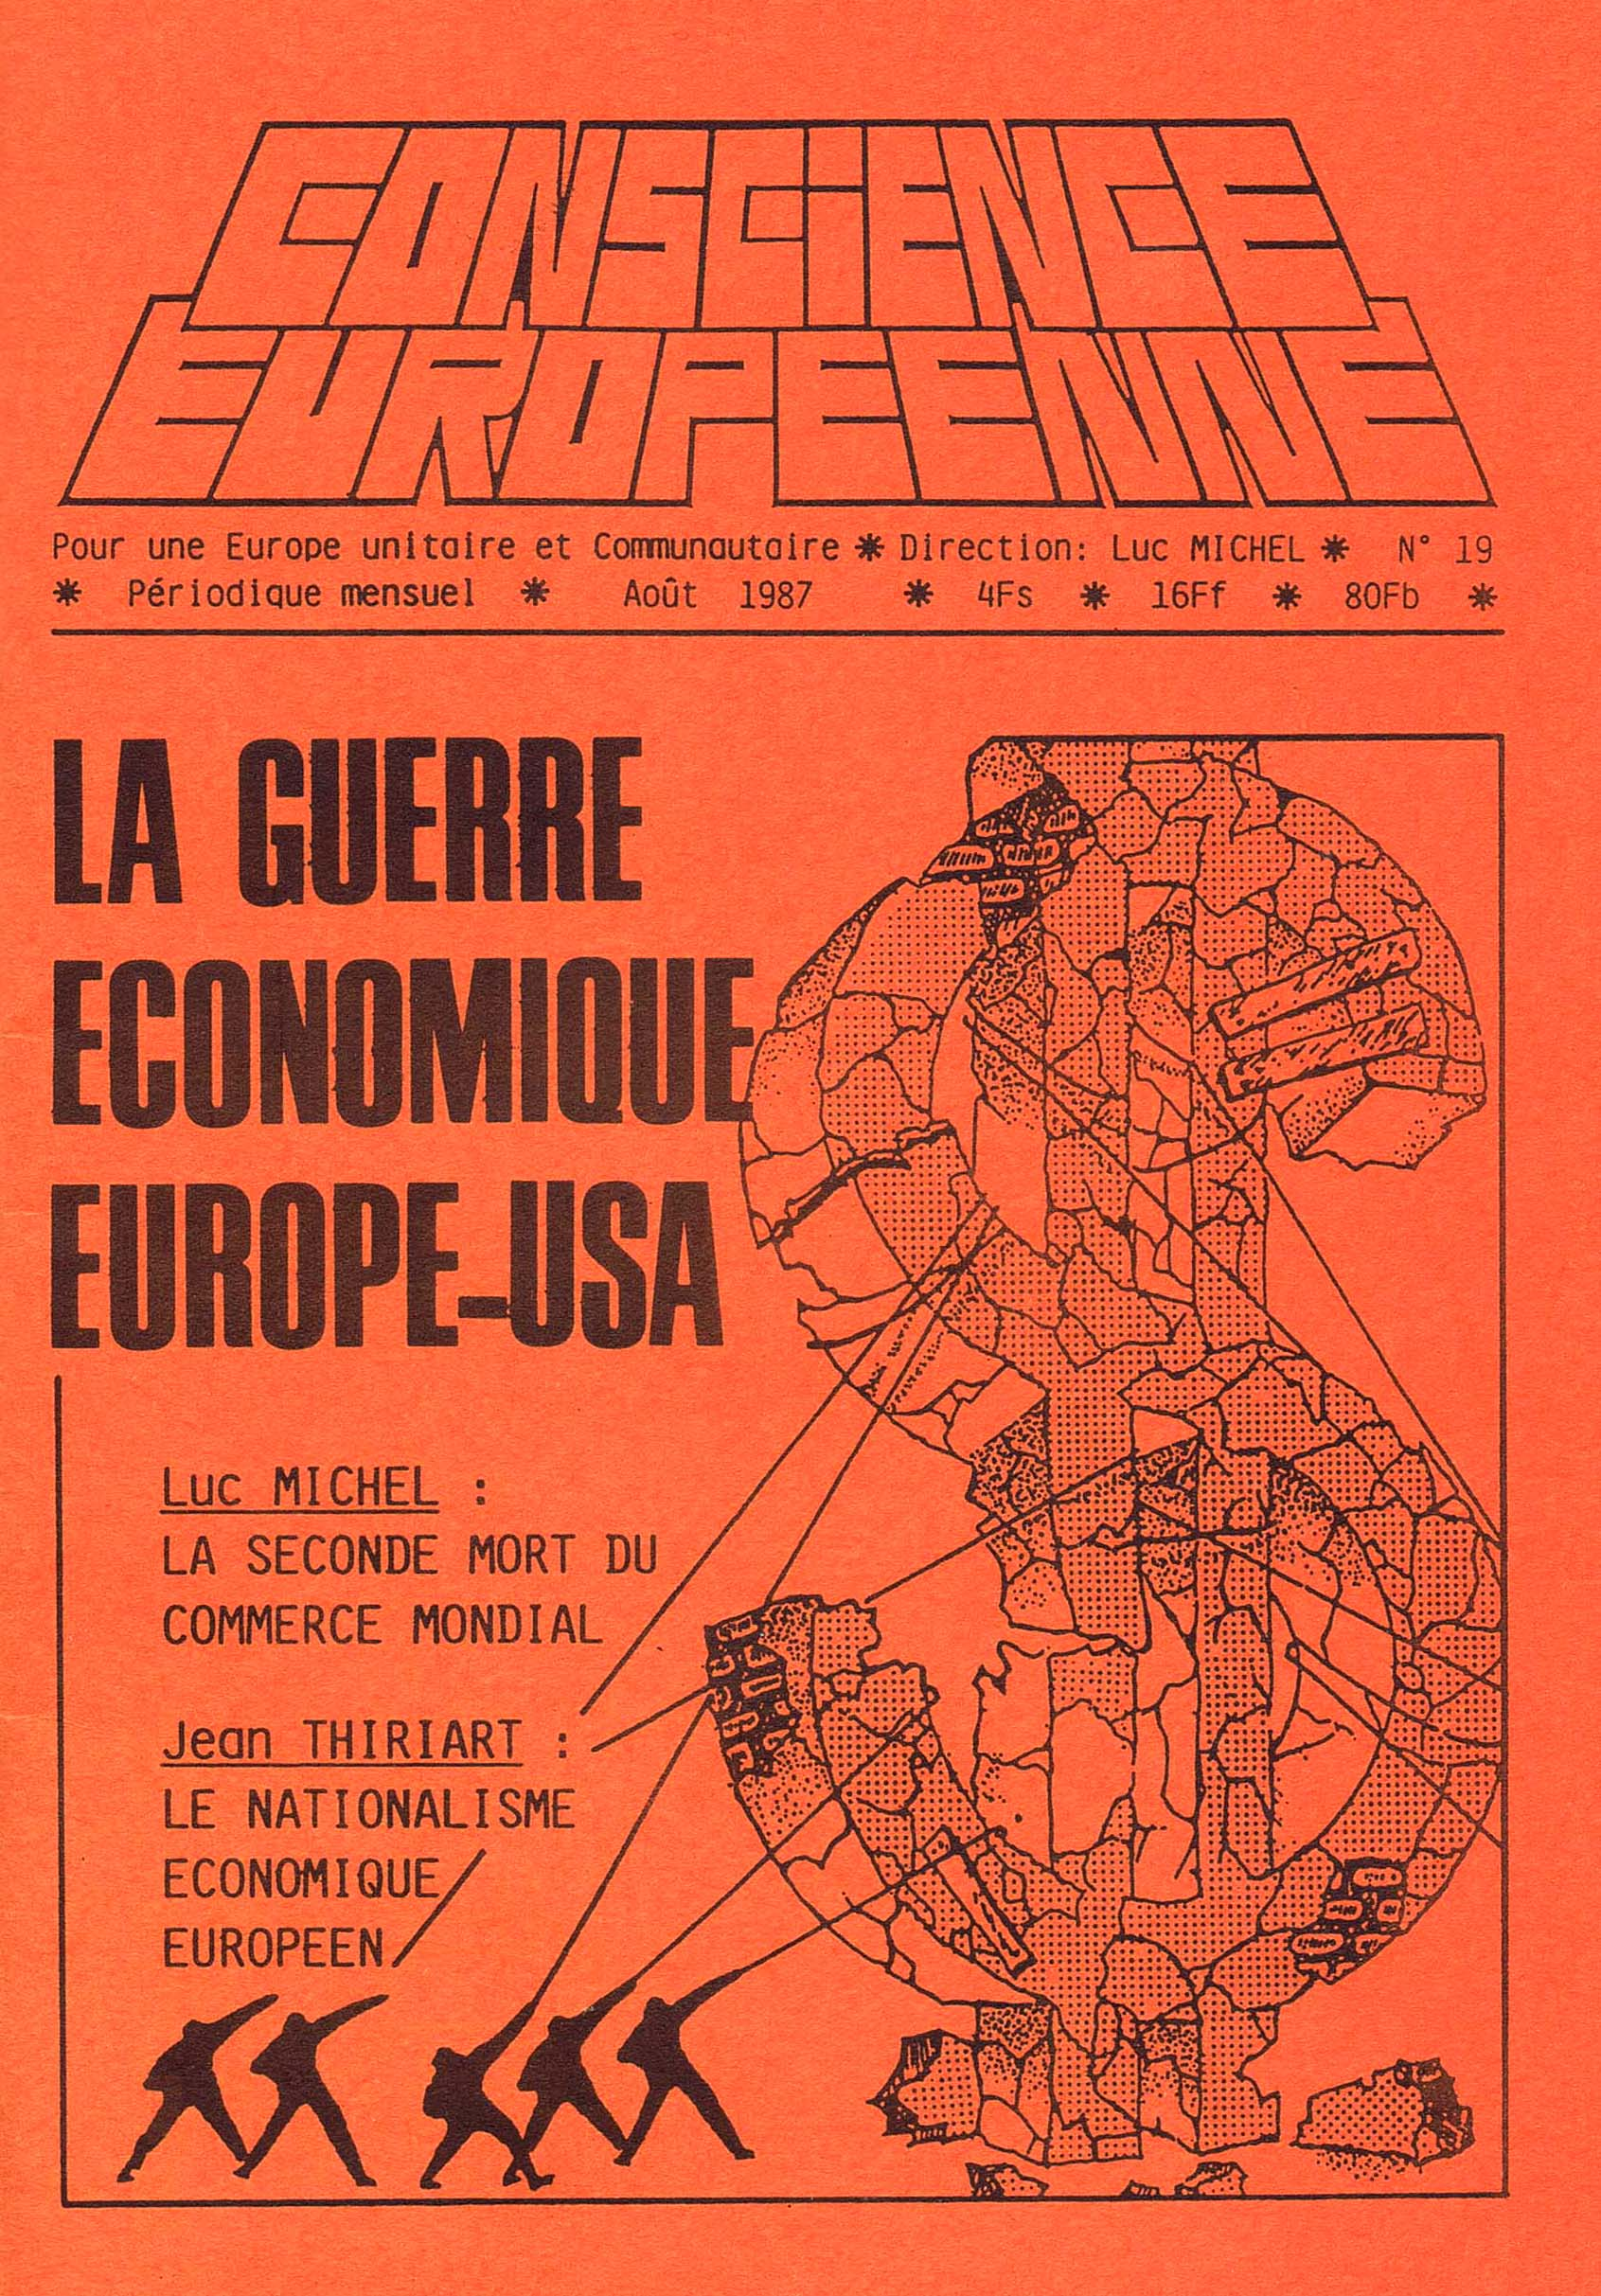 LM.GEOPOL - Genèse neoeurasisme II euro-soviet (2018 04 03) FR (4)